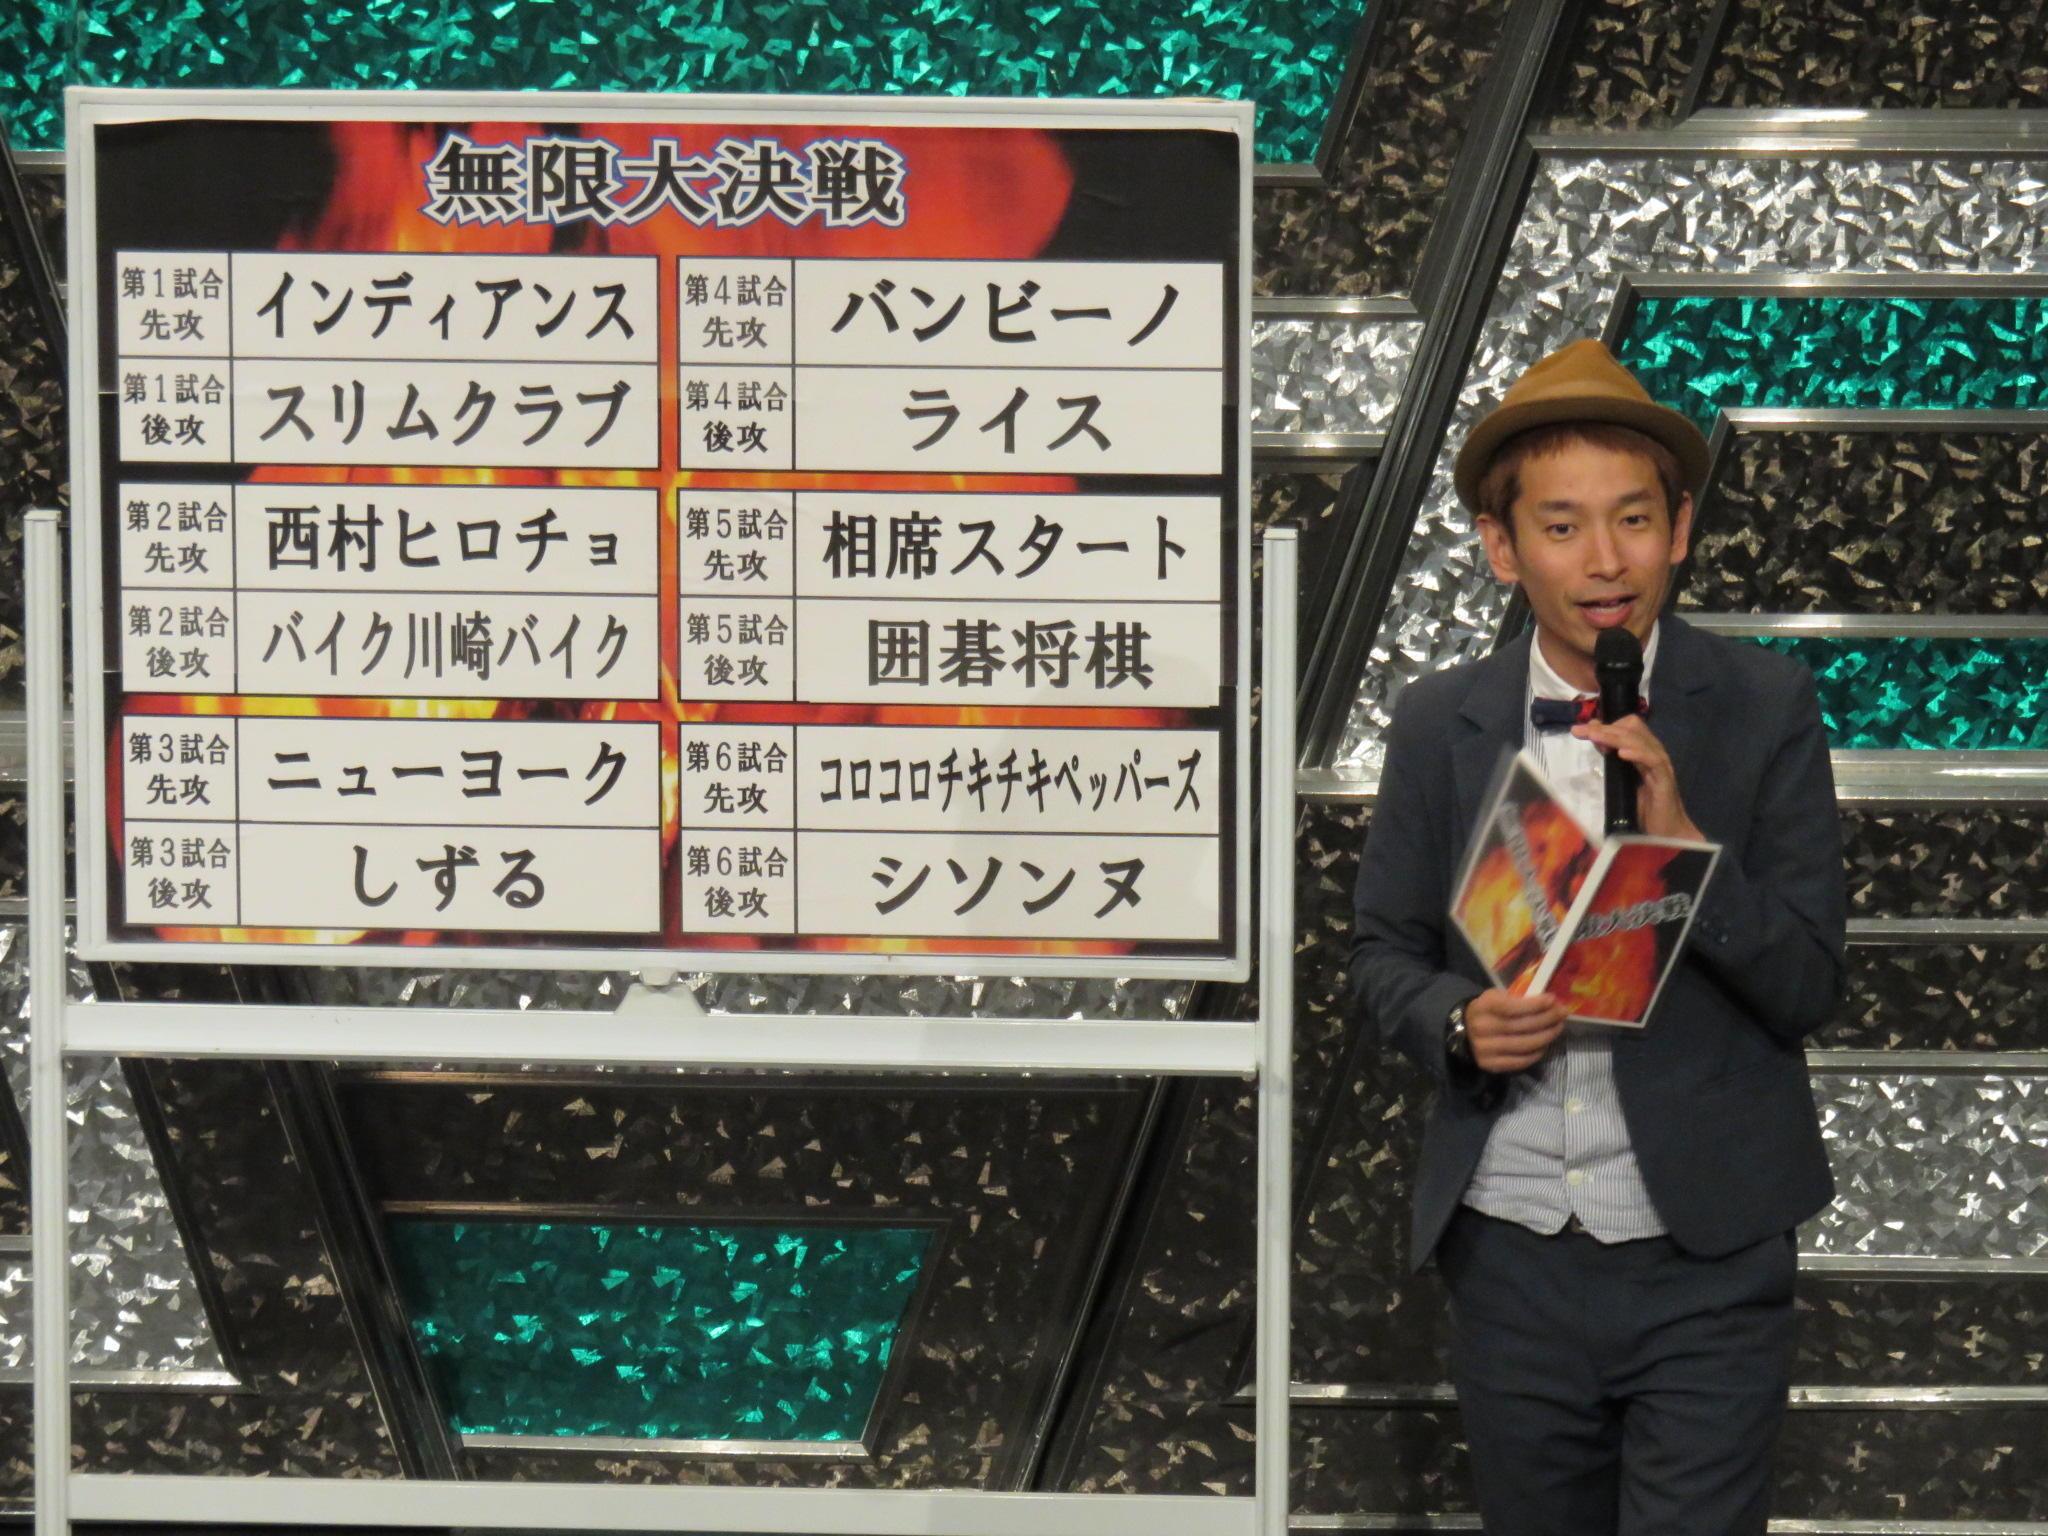 http://news.yoshimoto.co.jp/20161228212806-f89798faceae3e4eacf34973d0b936a6b219d271.jpg